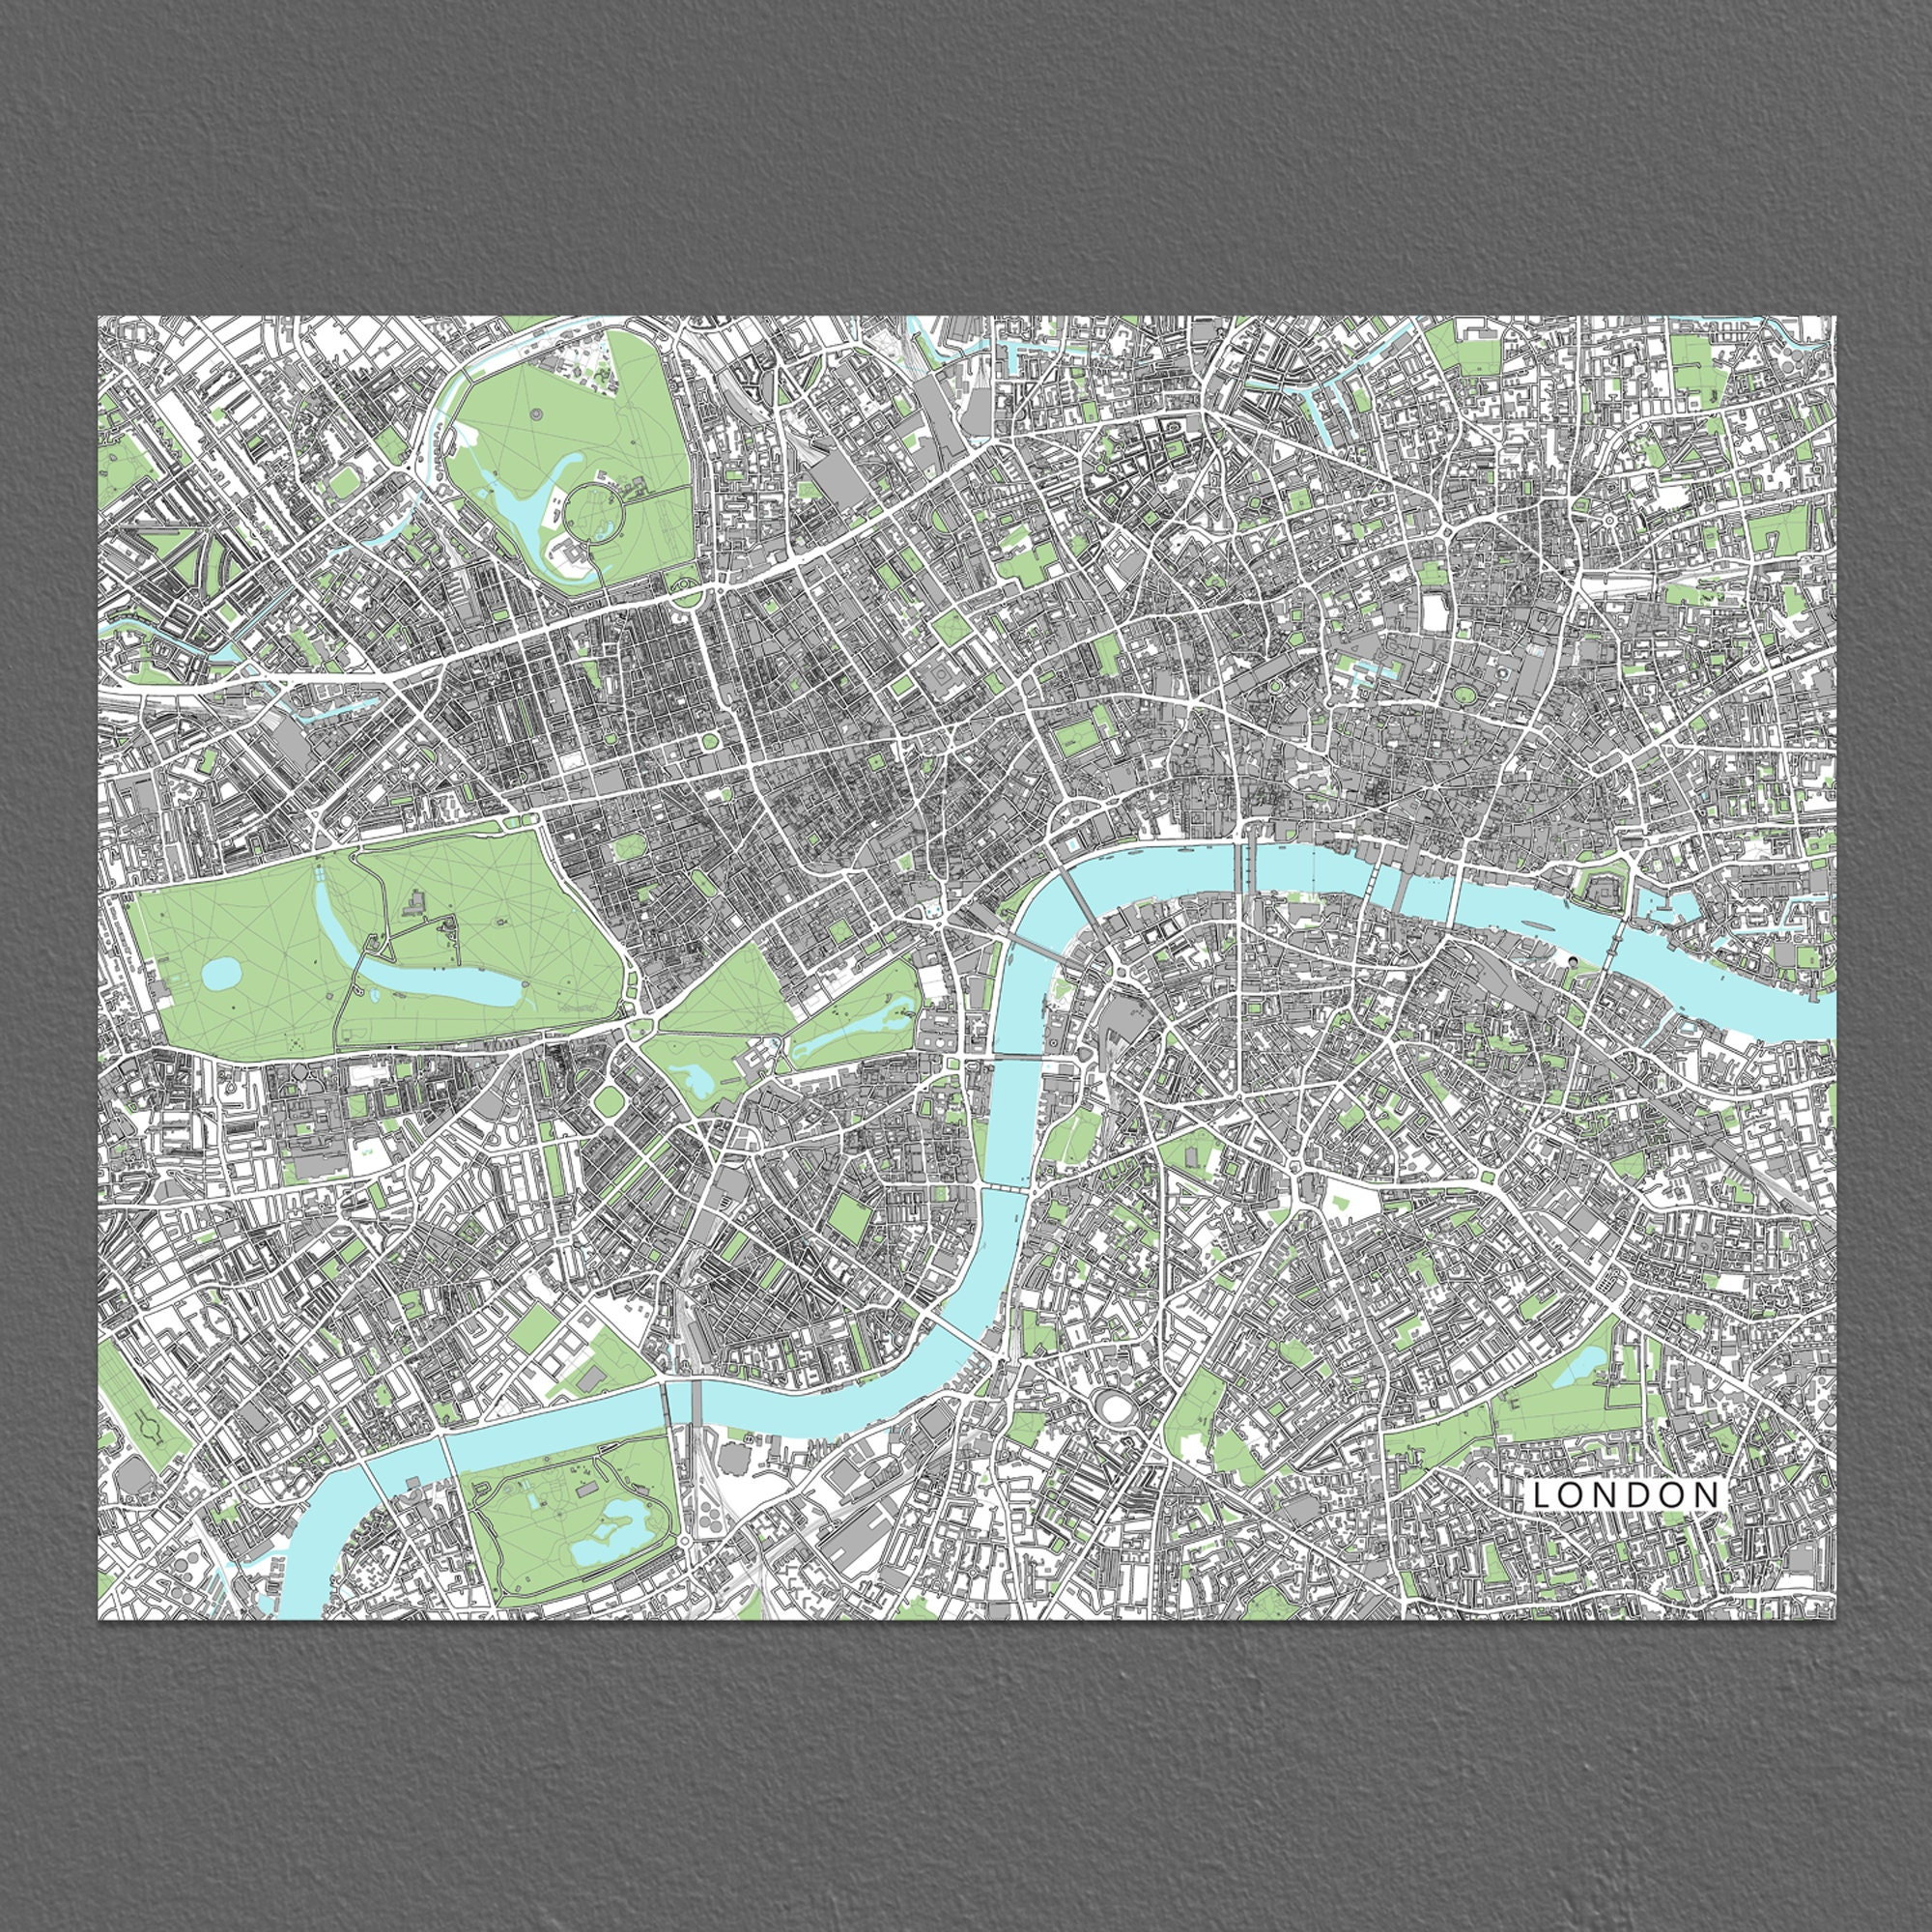 London City Map Printable.London Map Print London Art London City Map Poster London England Uk